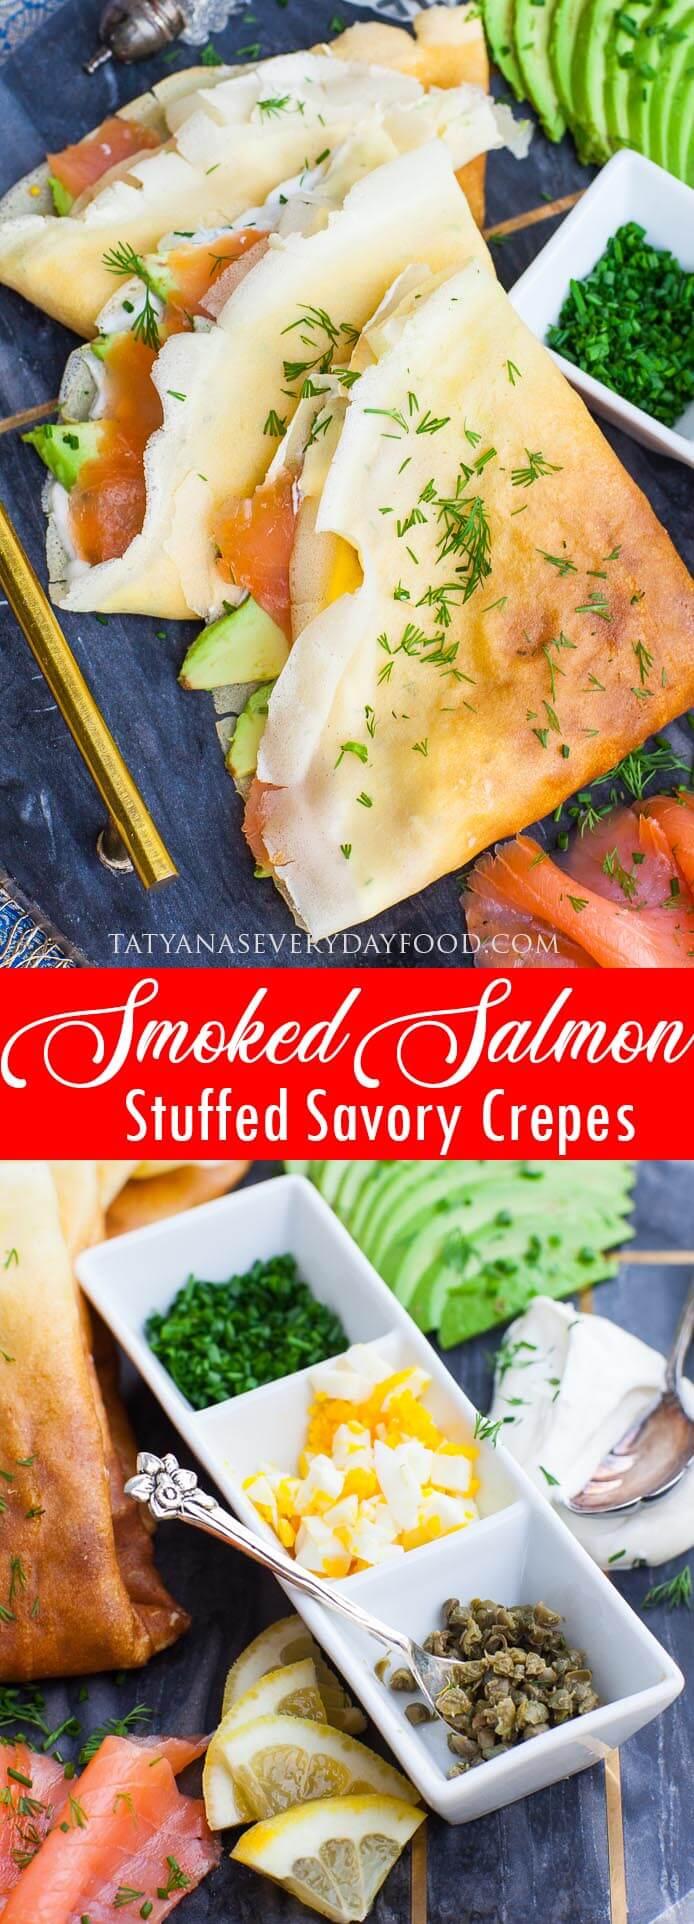 Smoked Salmon Savory Crepes video recipe - Brunch recipe idea